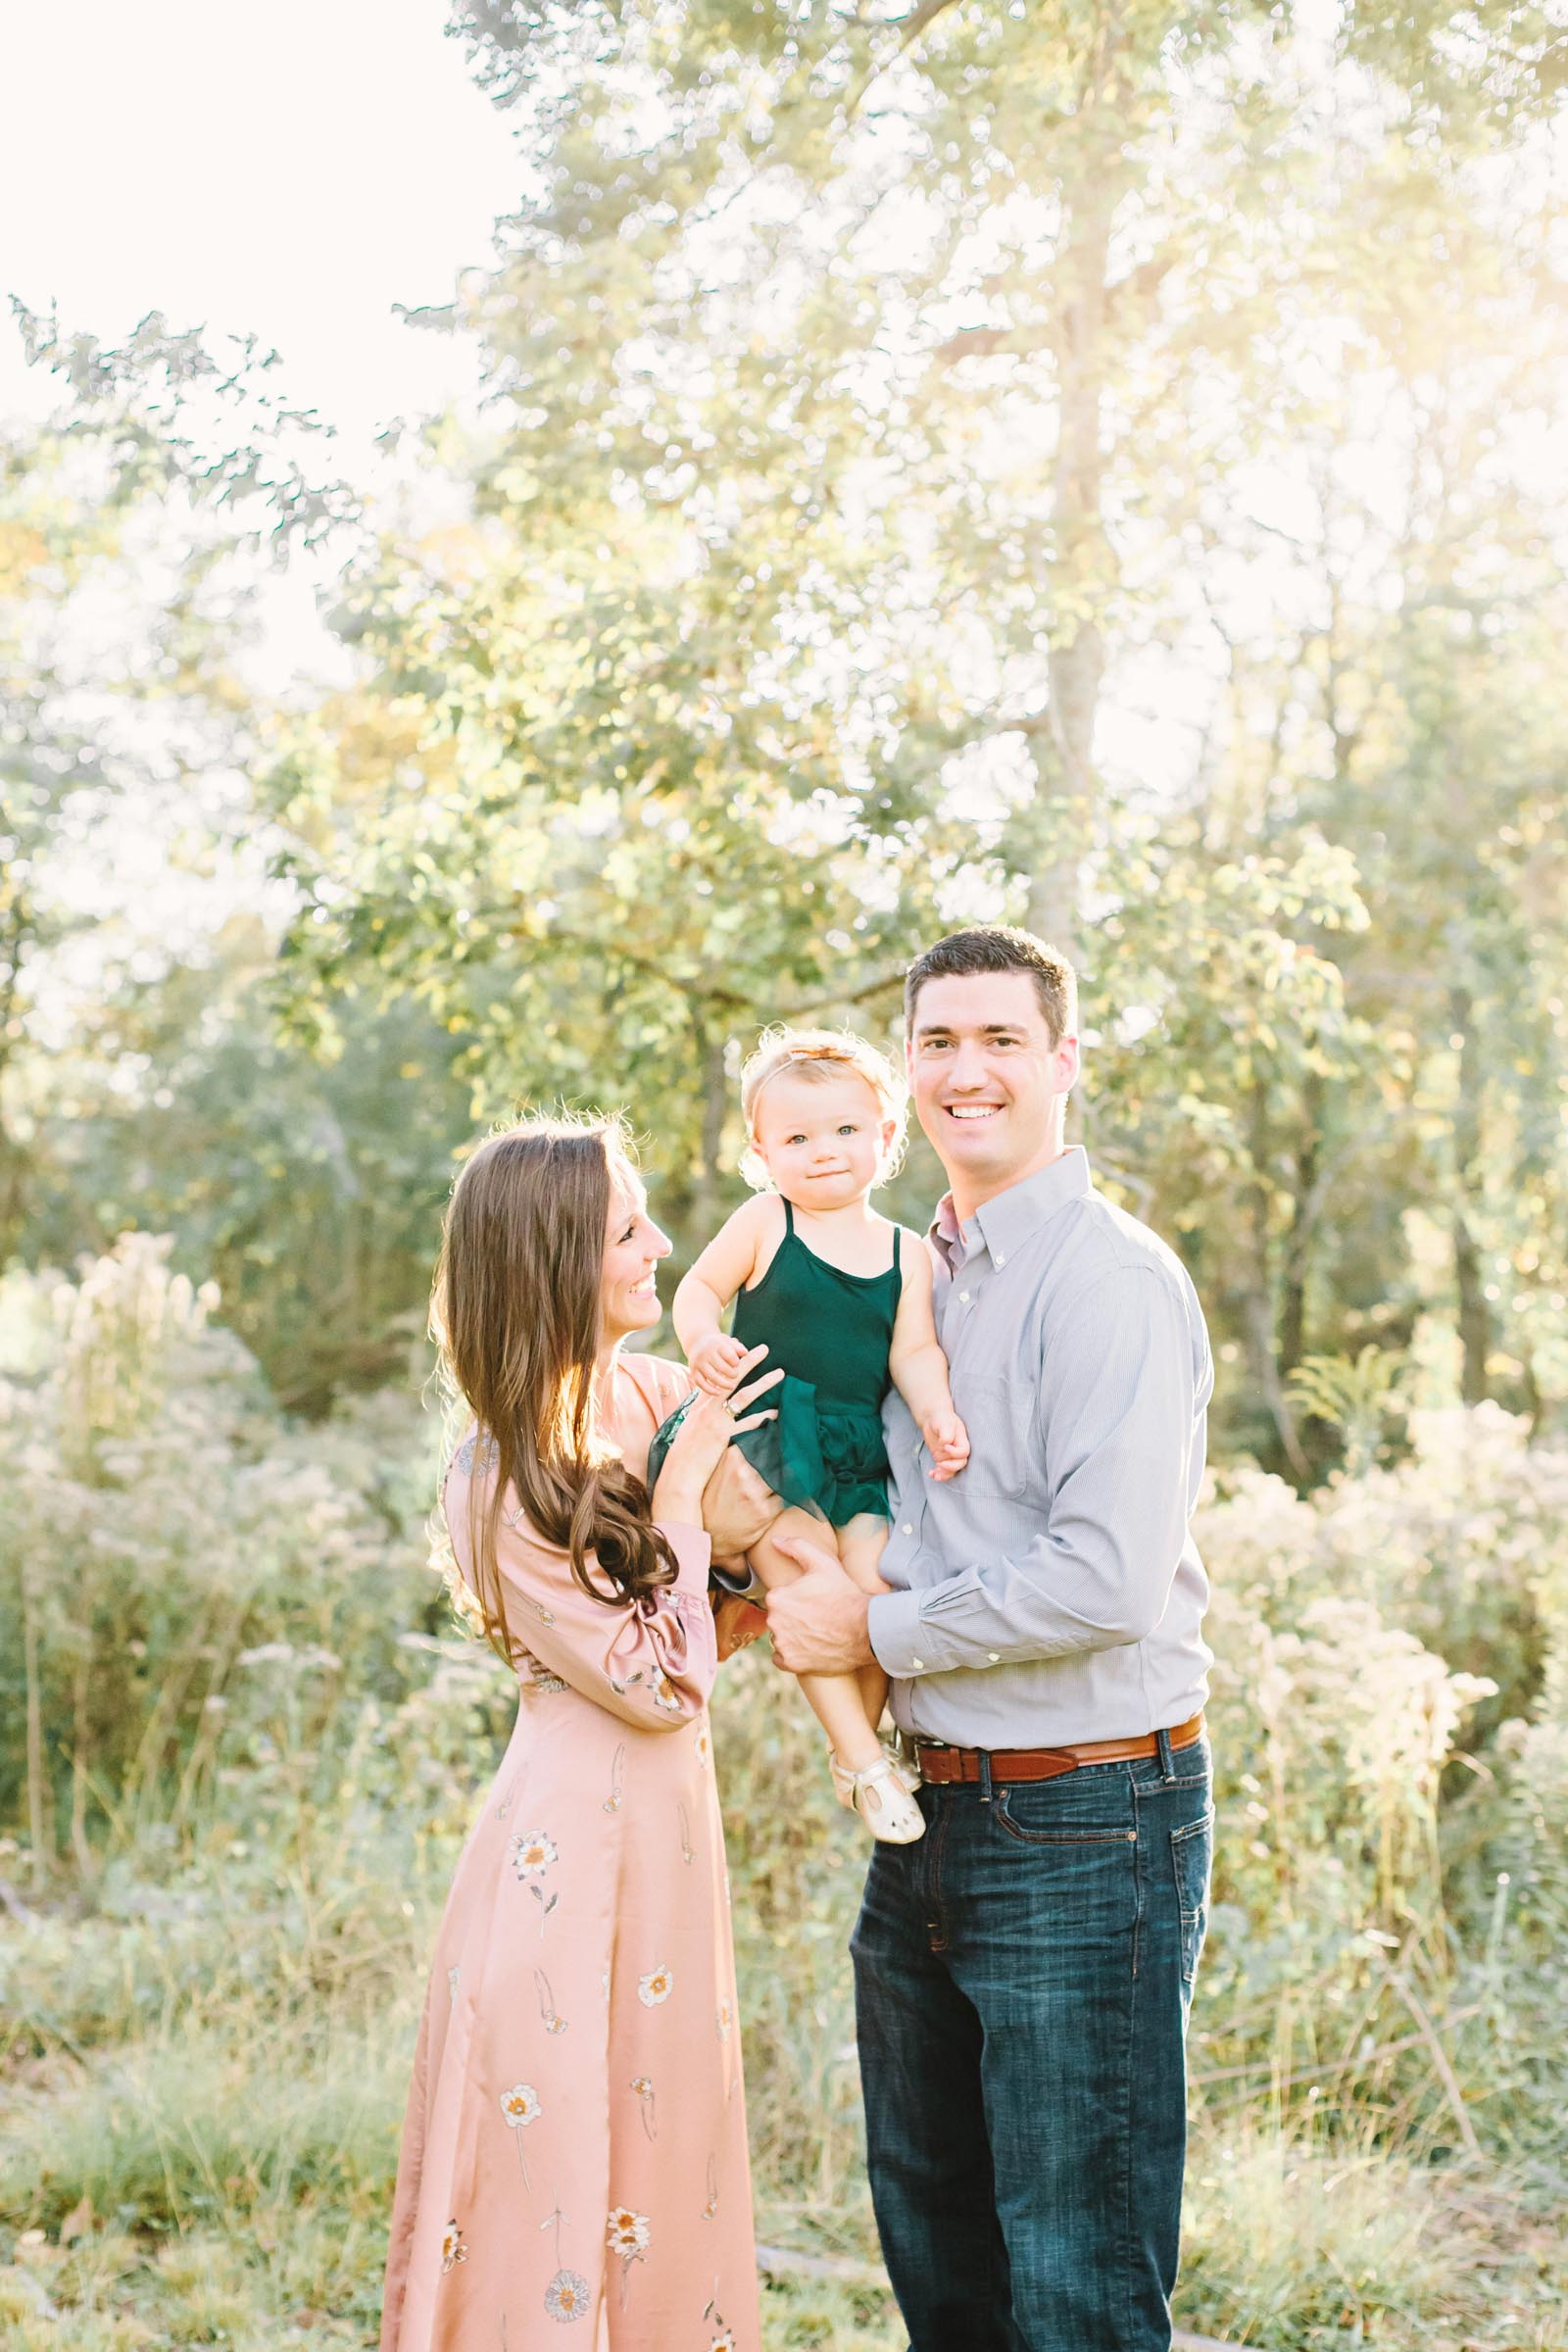 Cassie Schott Photography_Houston Family Photographer_Outdoor Portraits.jpg